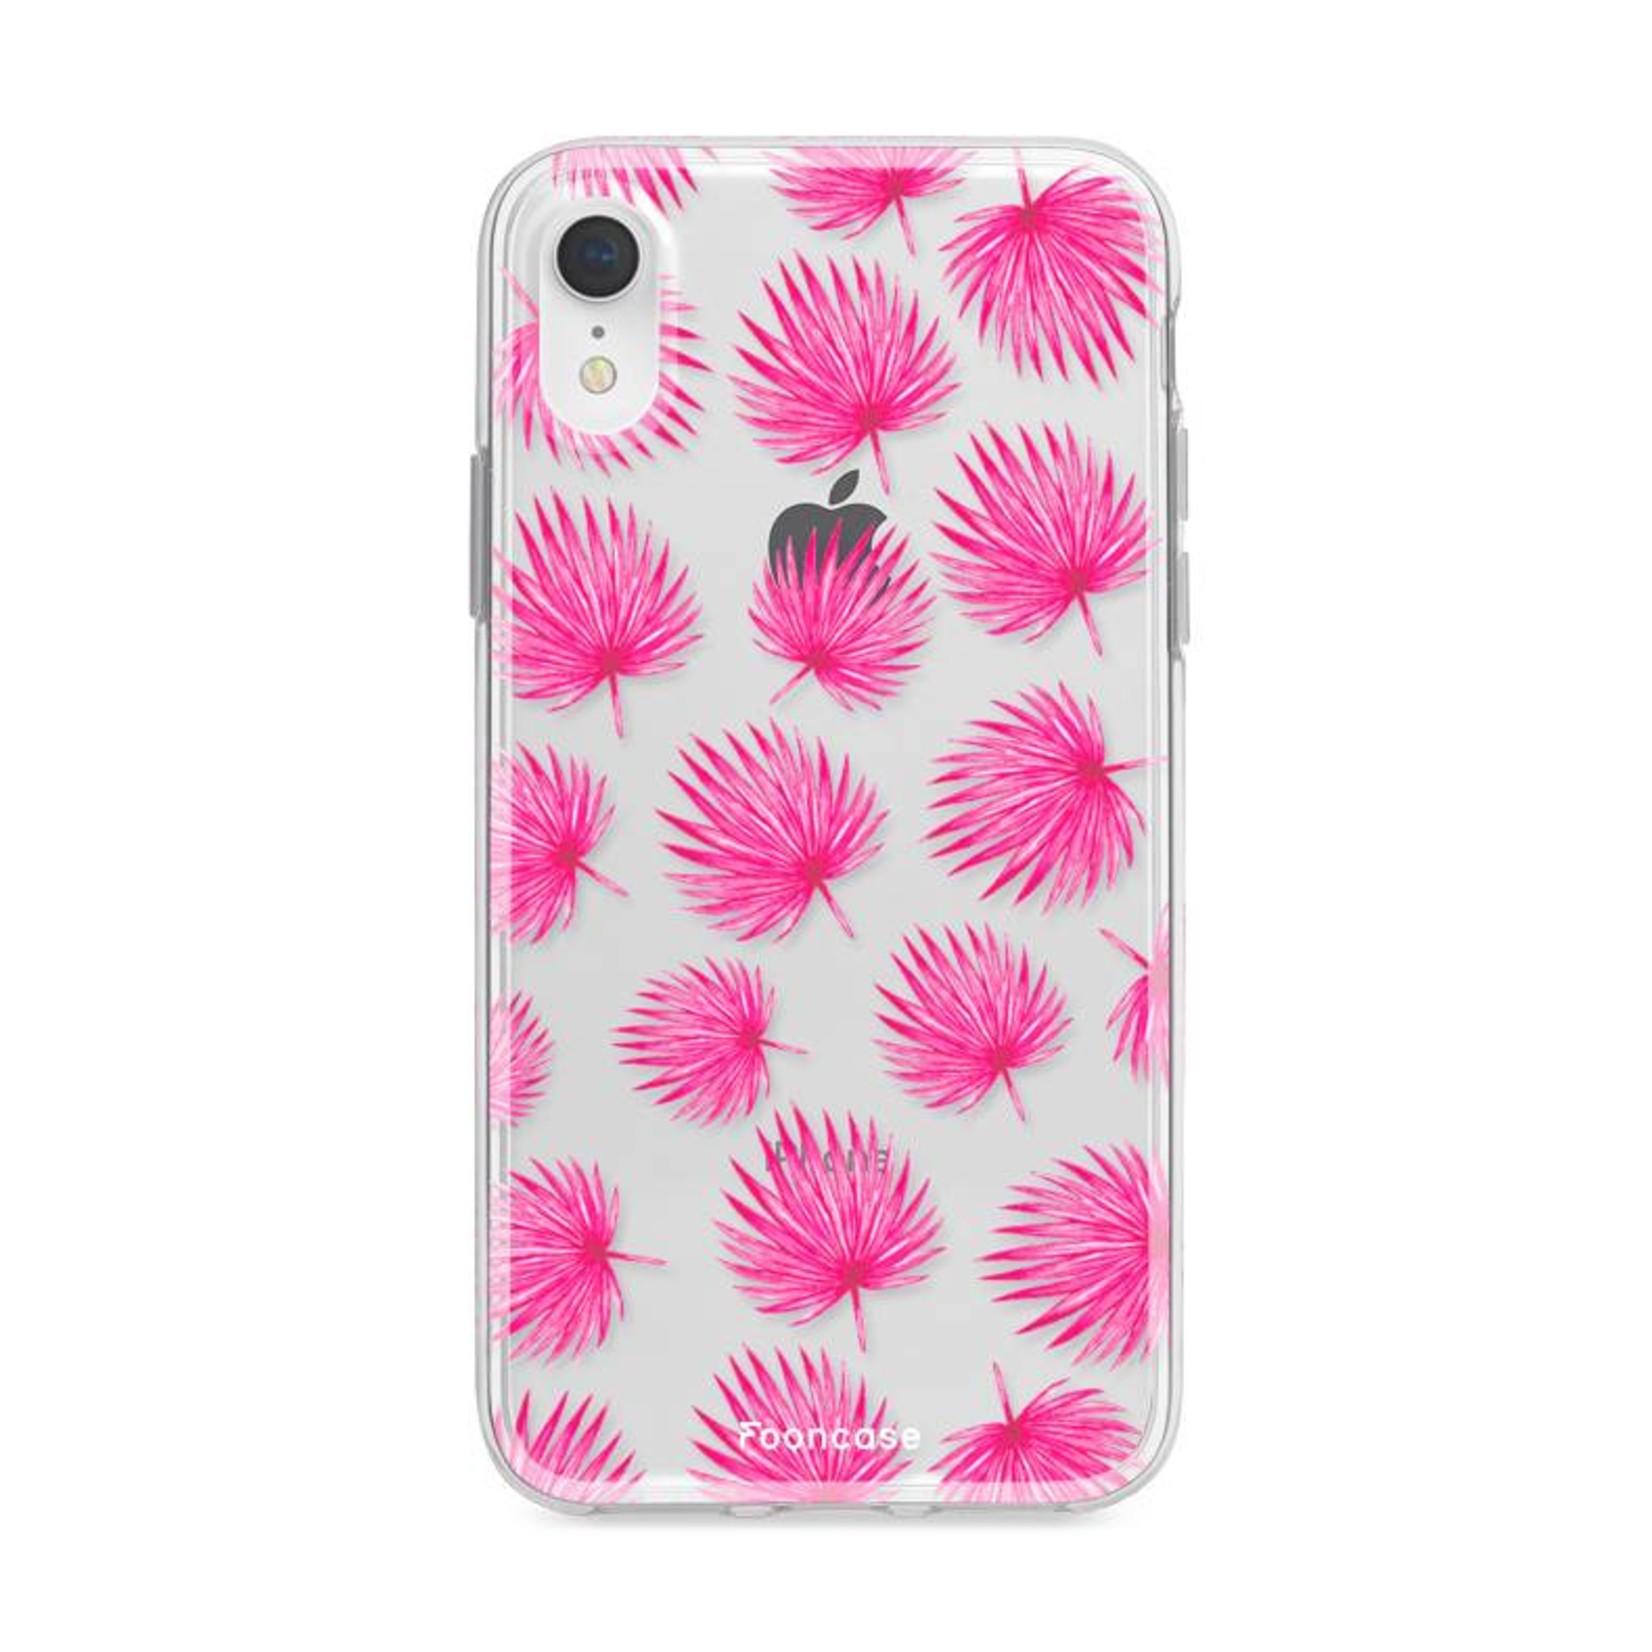 FOONCASE iPhone XR hoesje TPU Soft Case - Back Cover - Pink leaves / Roze bladeren